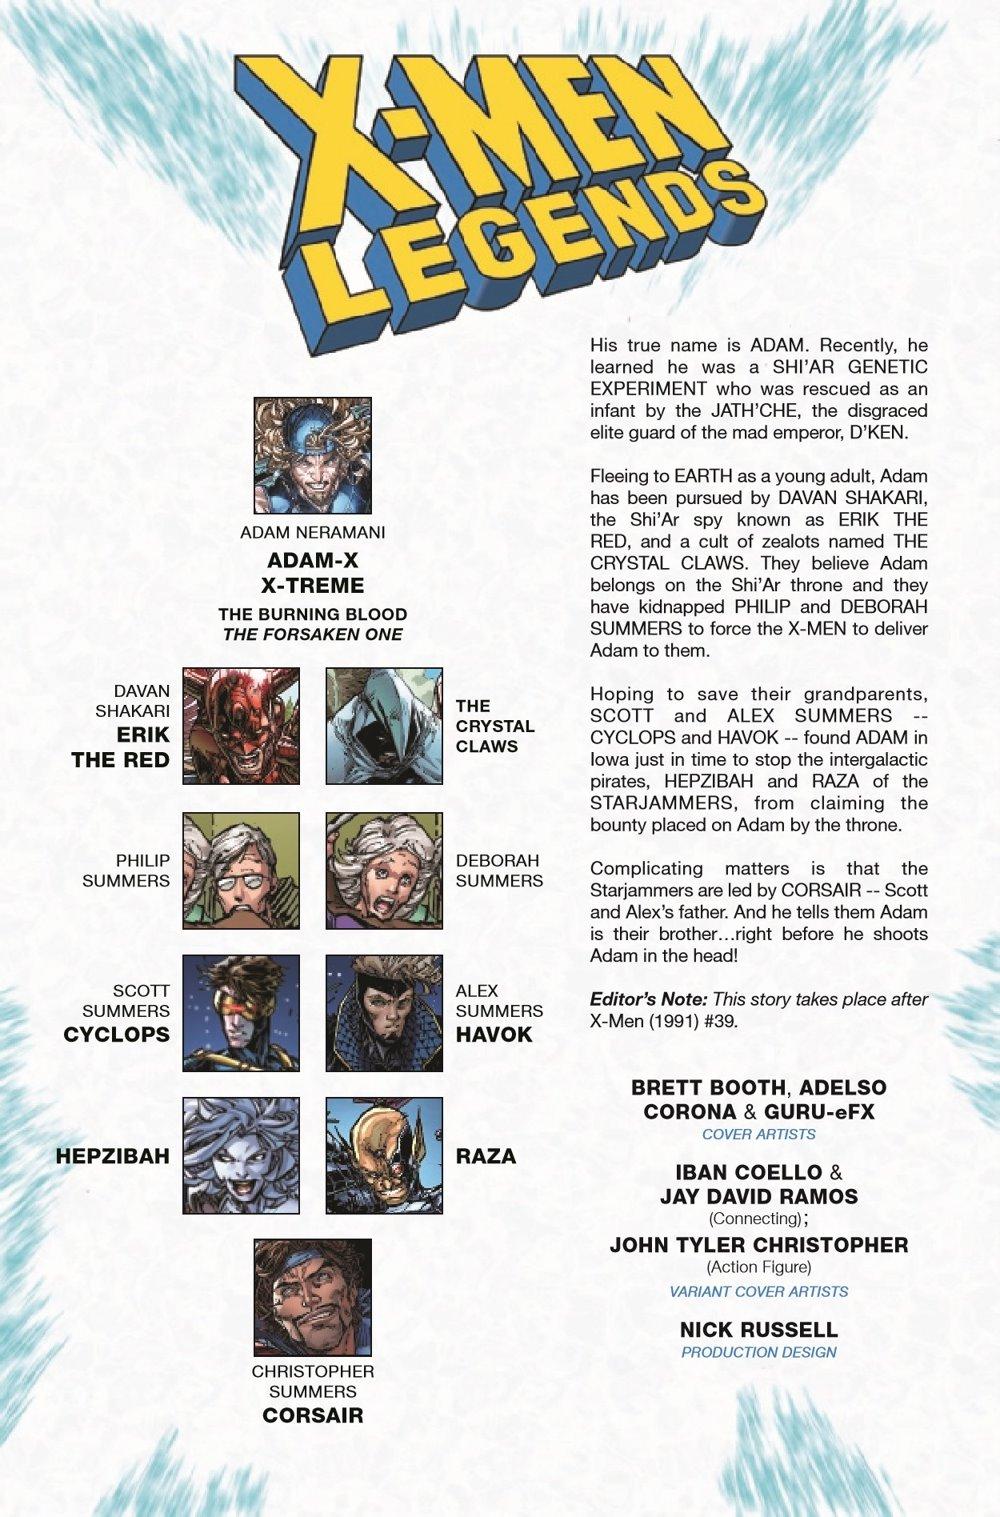 XMLEGENDS2021002_Preview-2 ComicList Previews: X-MEN LEGENDS #2